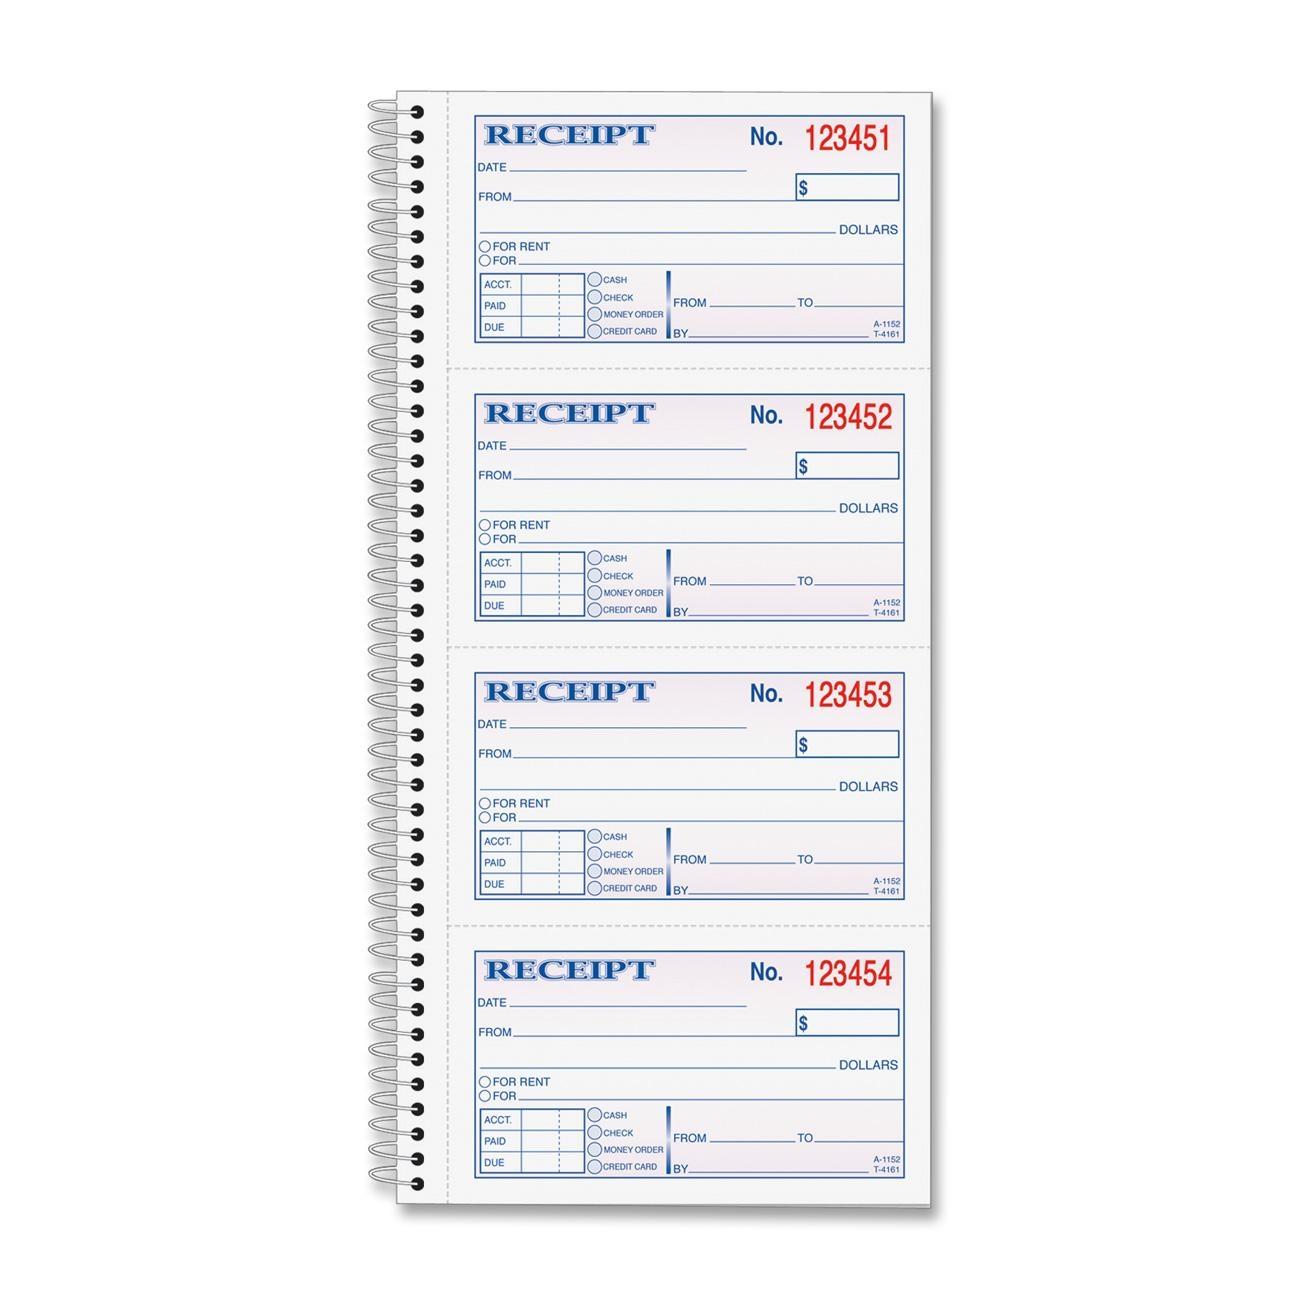 Doc605760 Rent Slip Pdf Doc605760 Rent Slip Pdf rent receipts – Rent Slip